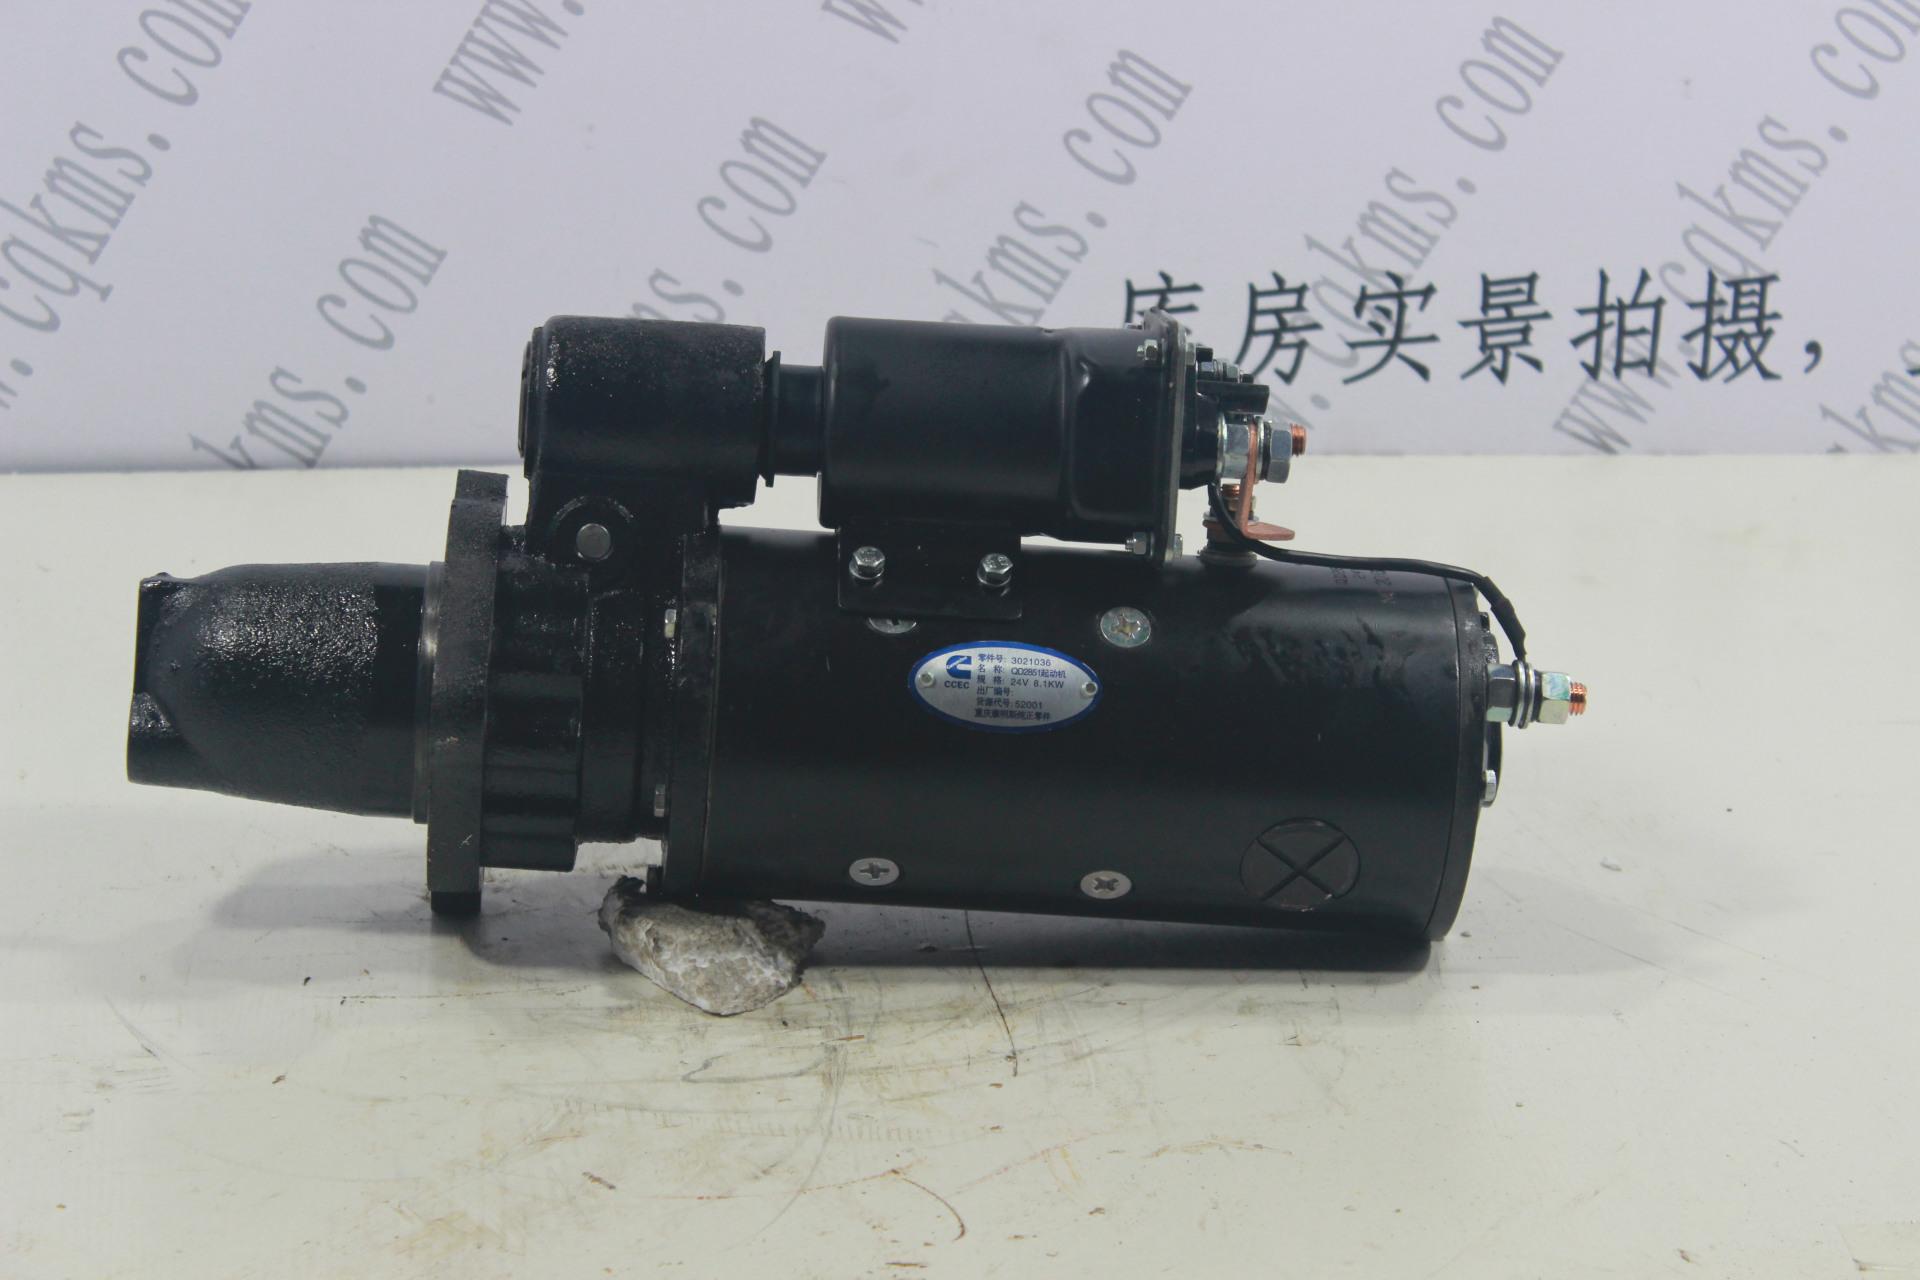 kms00125-3021036-起动机总成---参考规格55*25.5*21CM含包装图片1